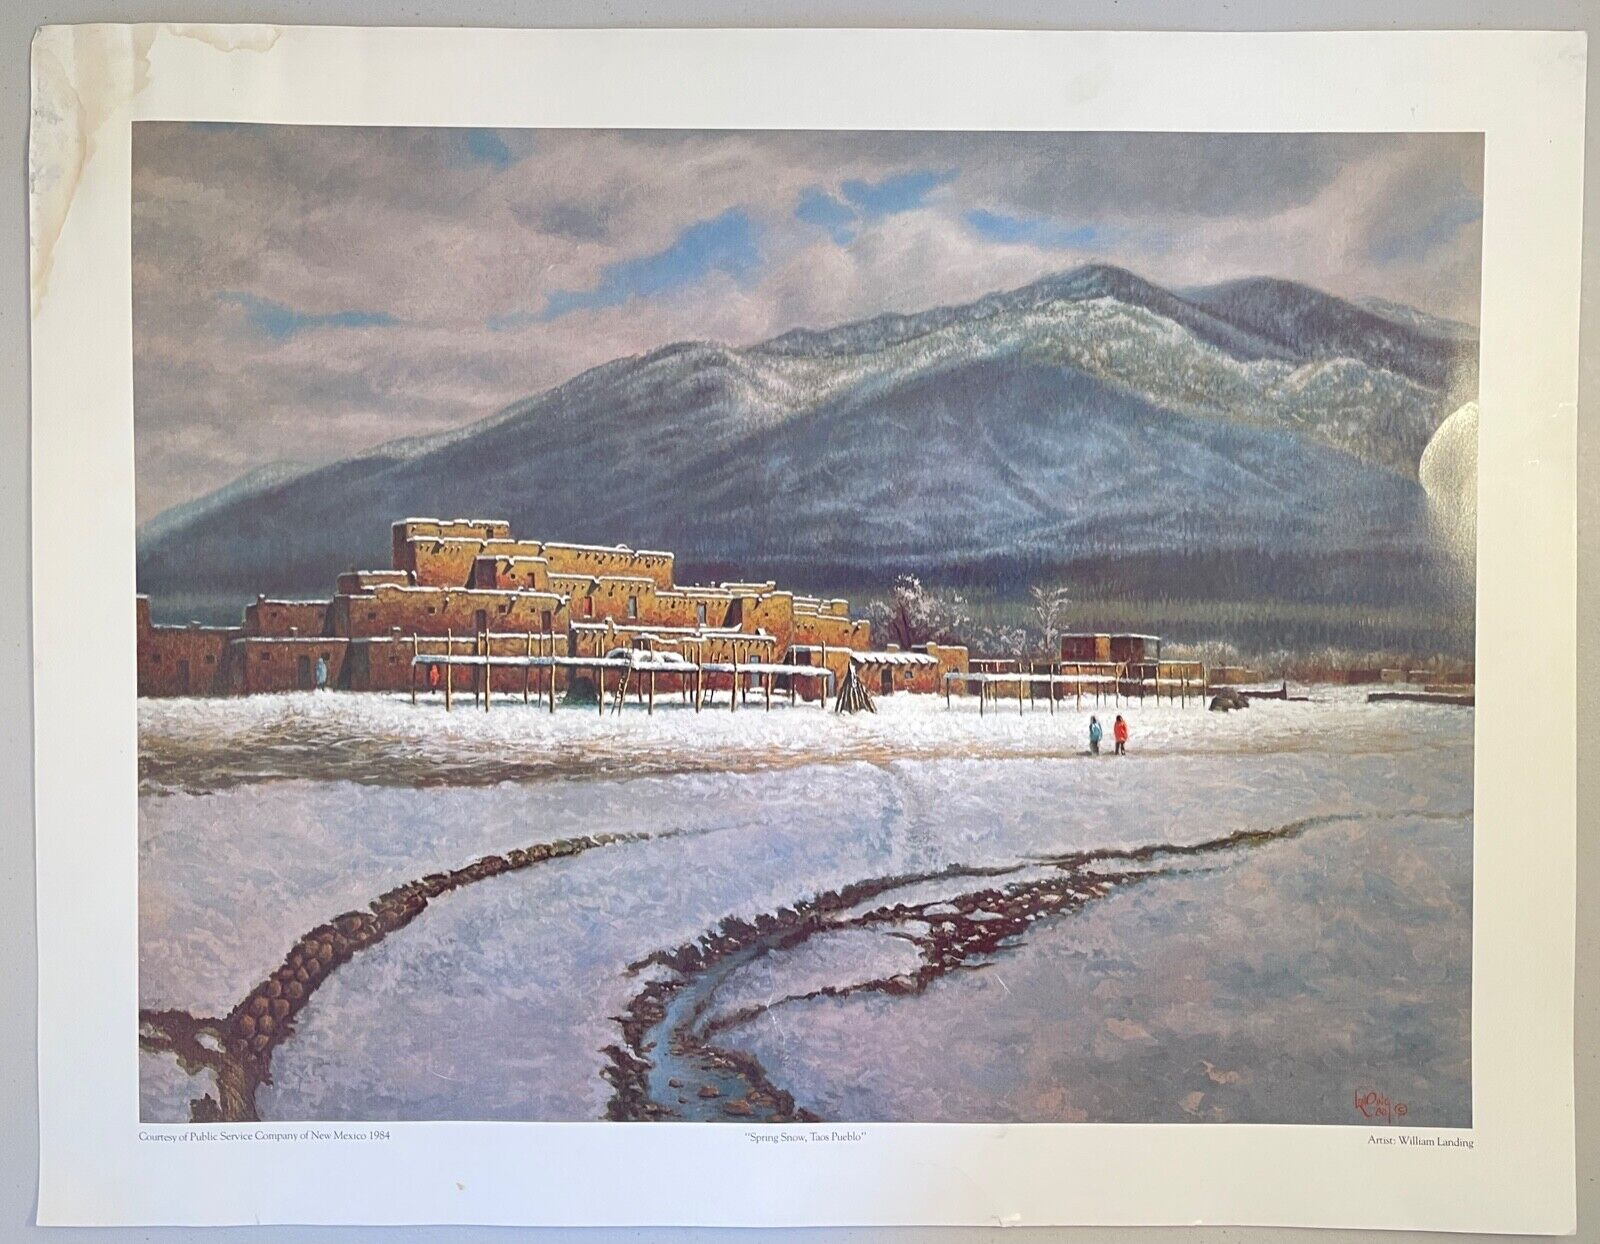 VTG Art Print C1980 Spring Snow, Taos Pueblo Winter New Mexico William Landing - $19.99